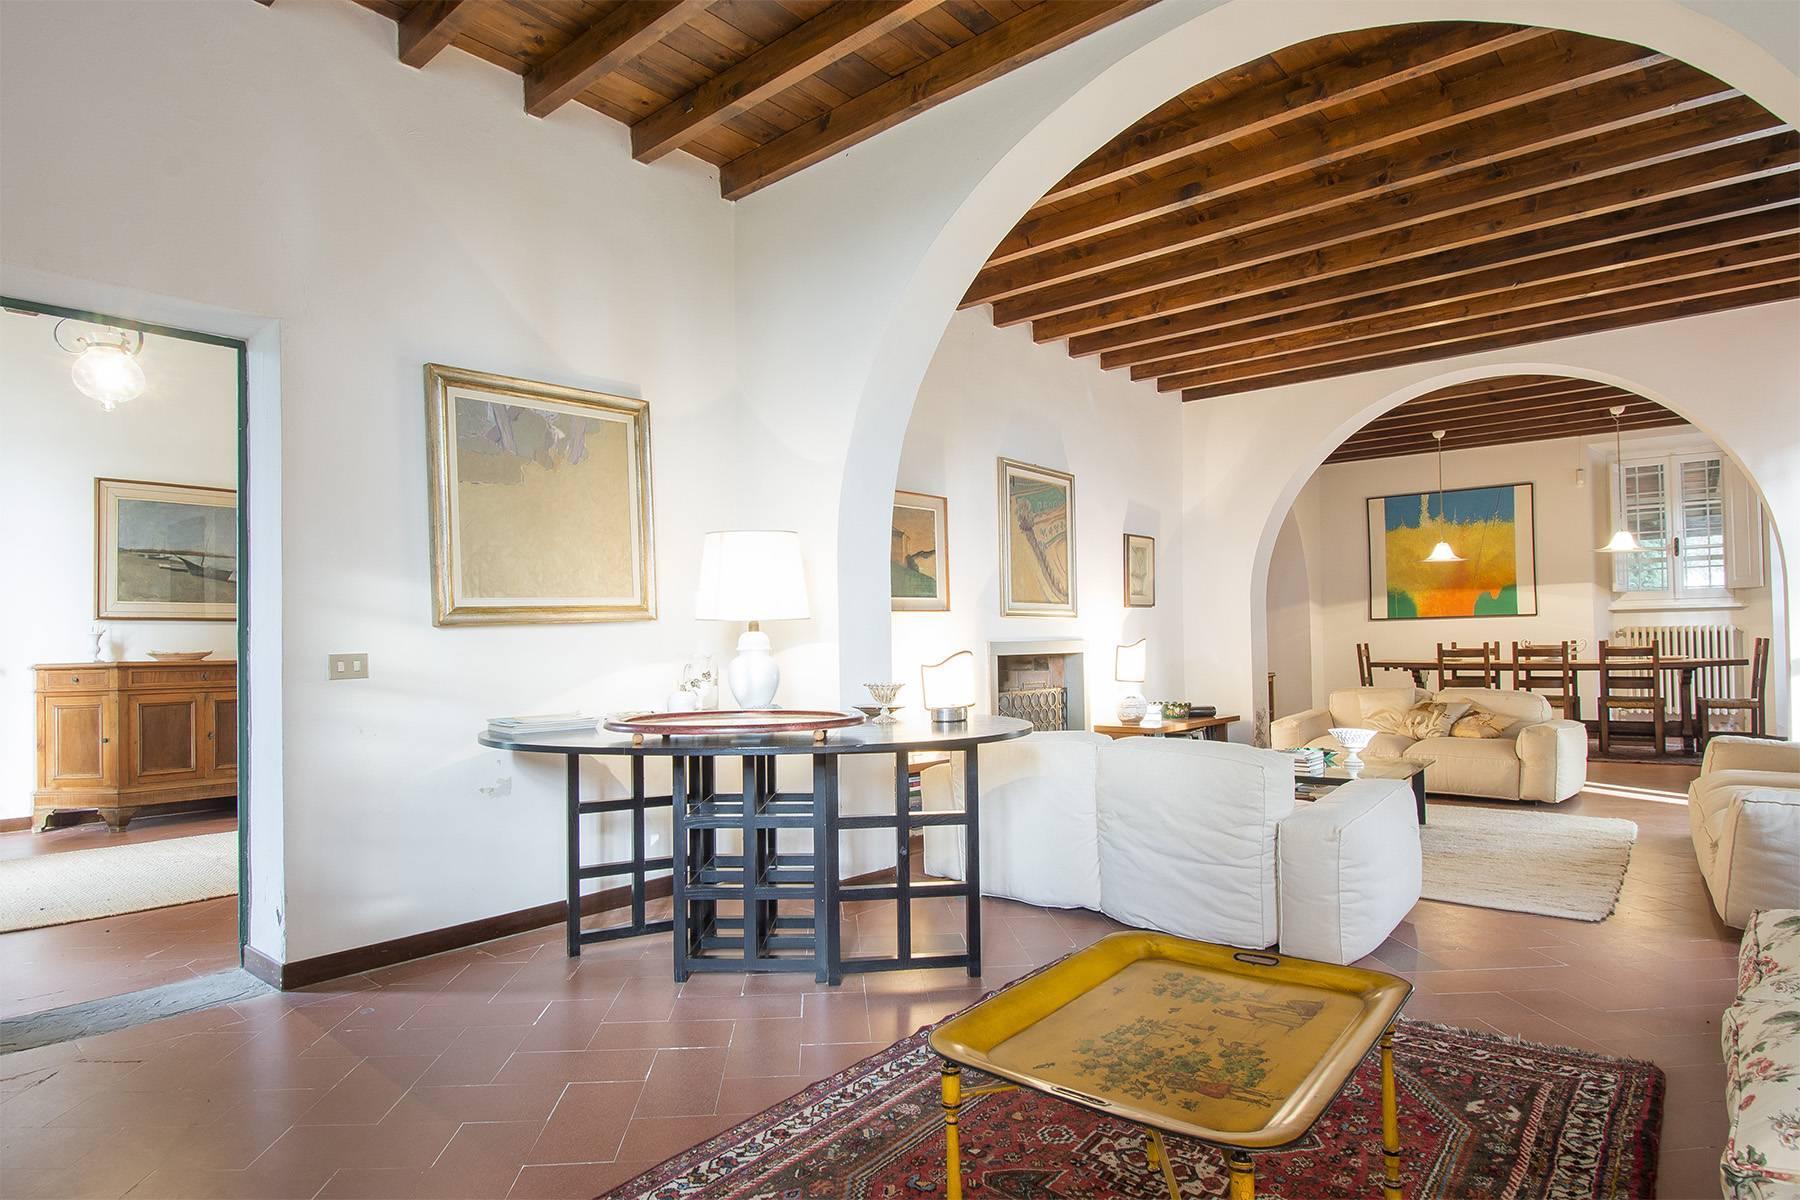 Winery with Historic Villa in San Miniato, Pisa - 5